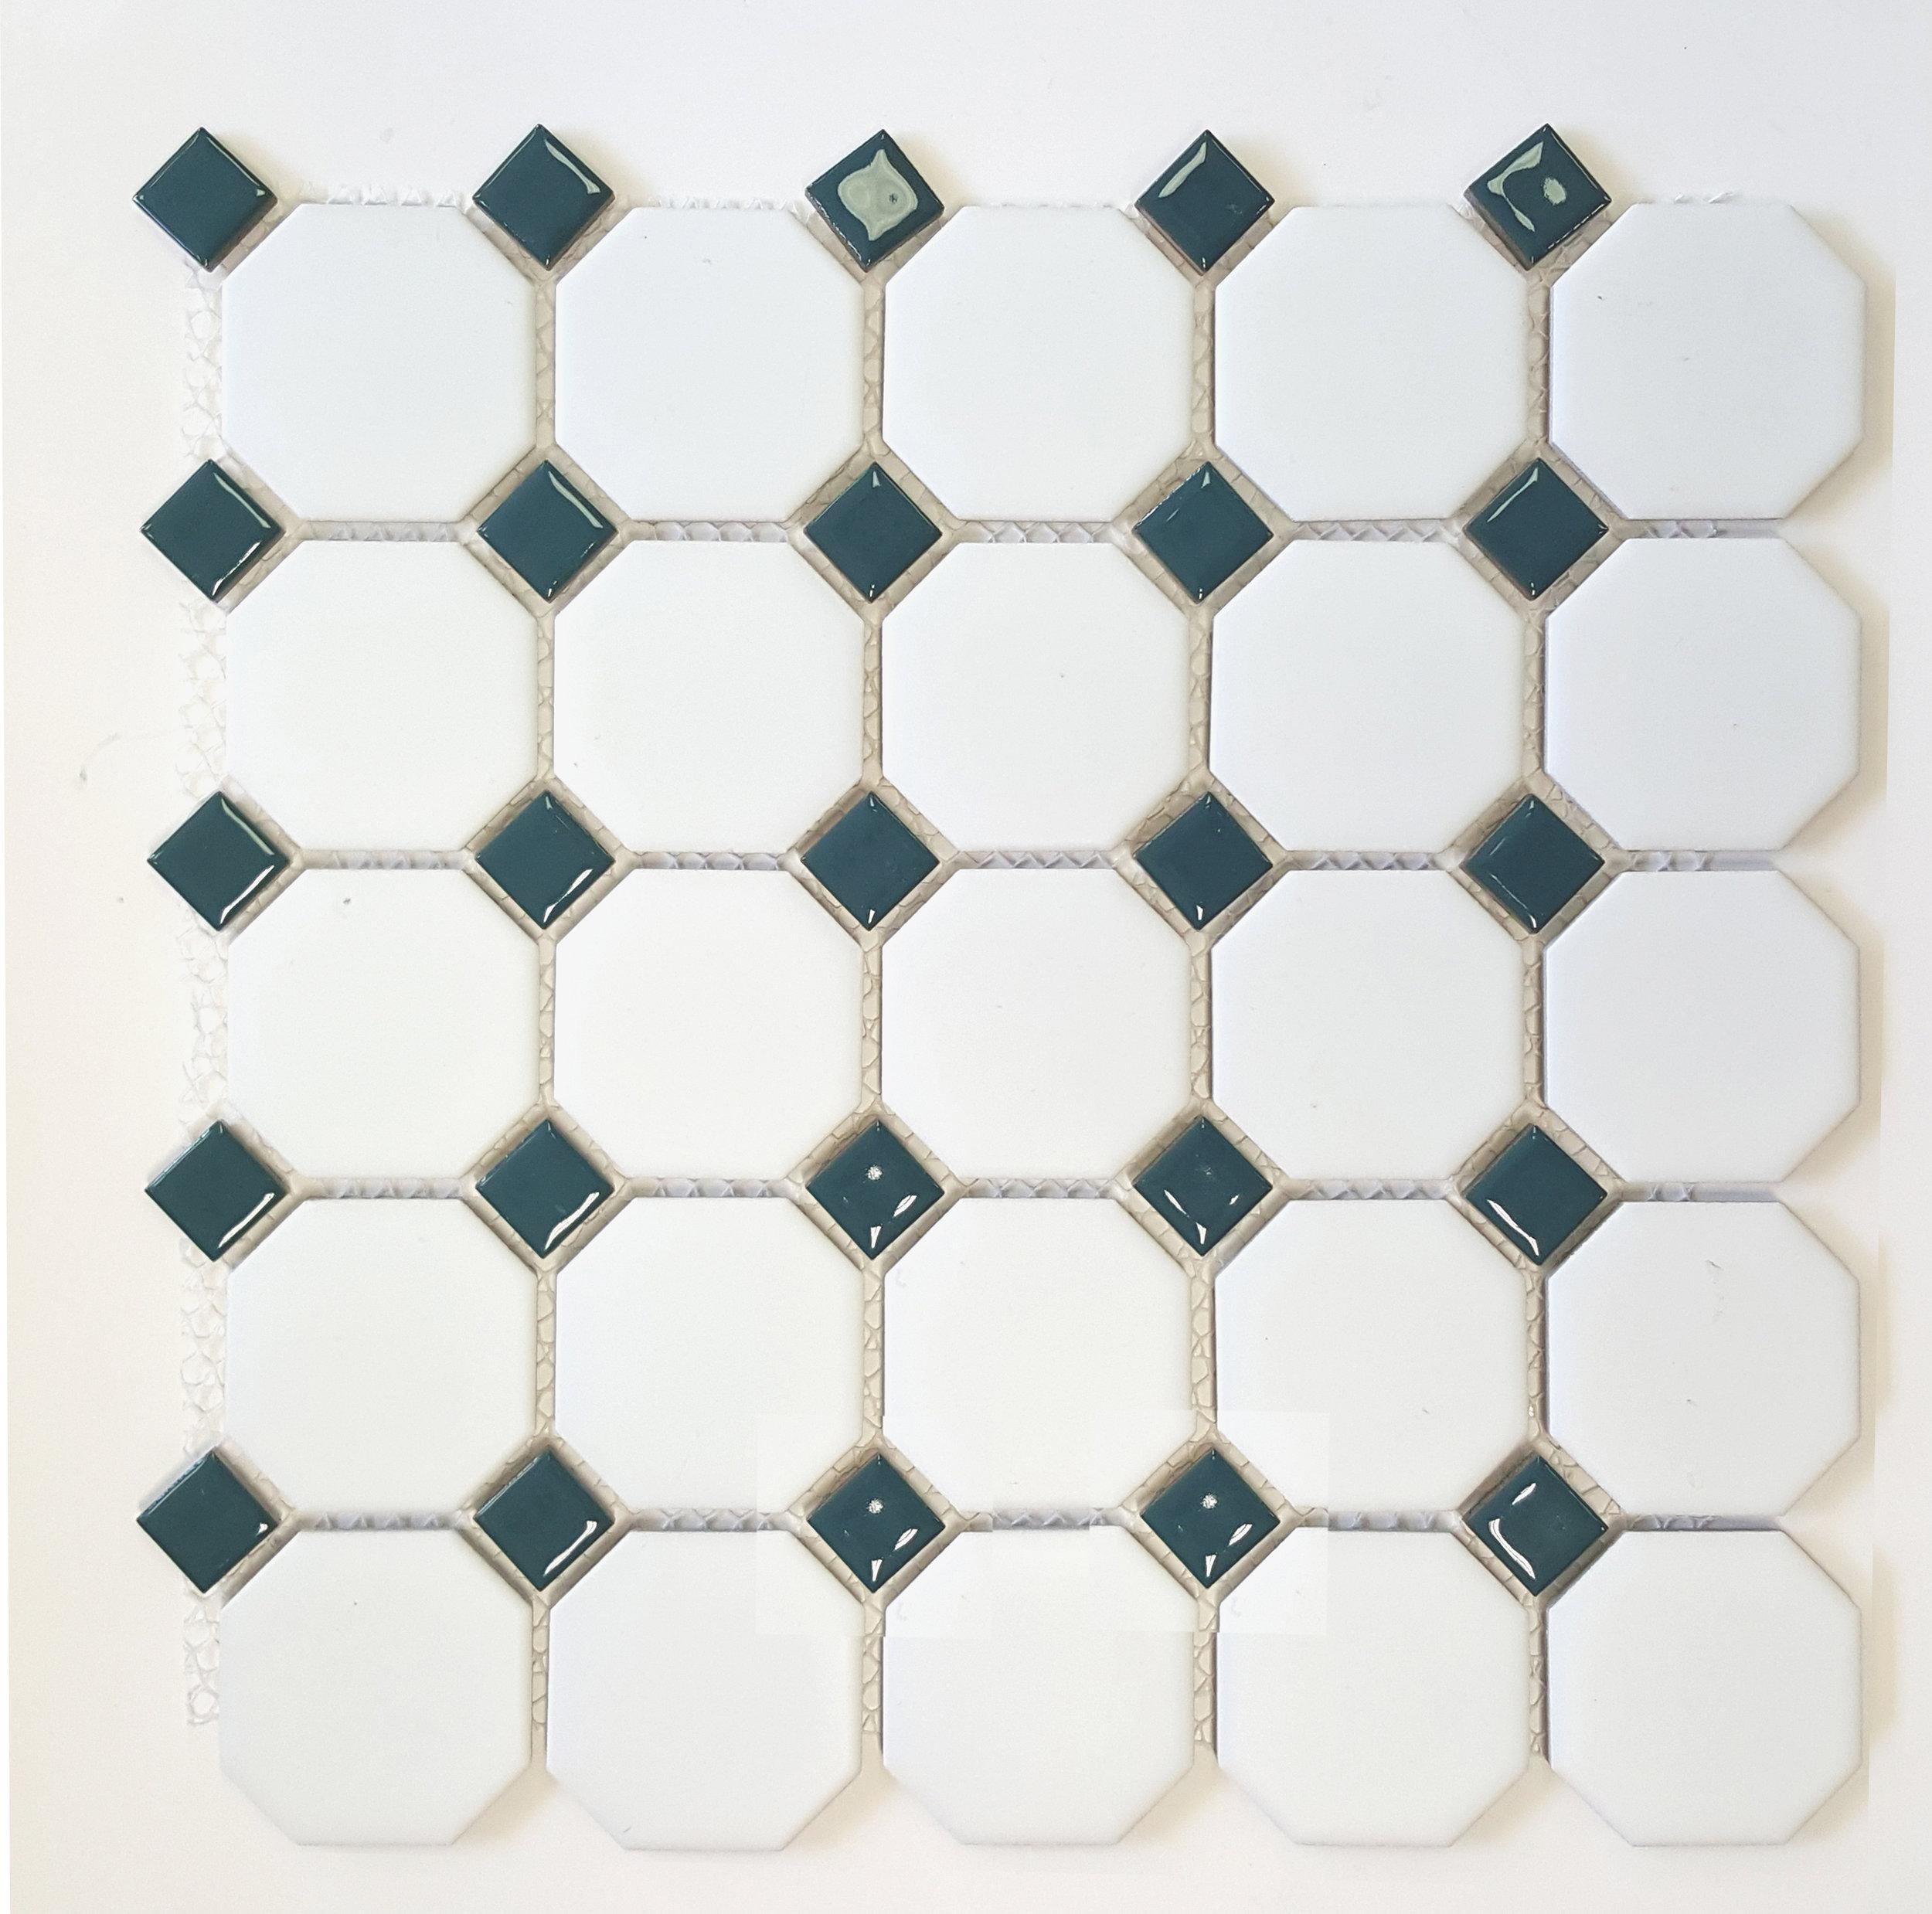 "OCT-519  Octagon 2-1/4"" Matte White w/ Shiny Teal Dot"